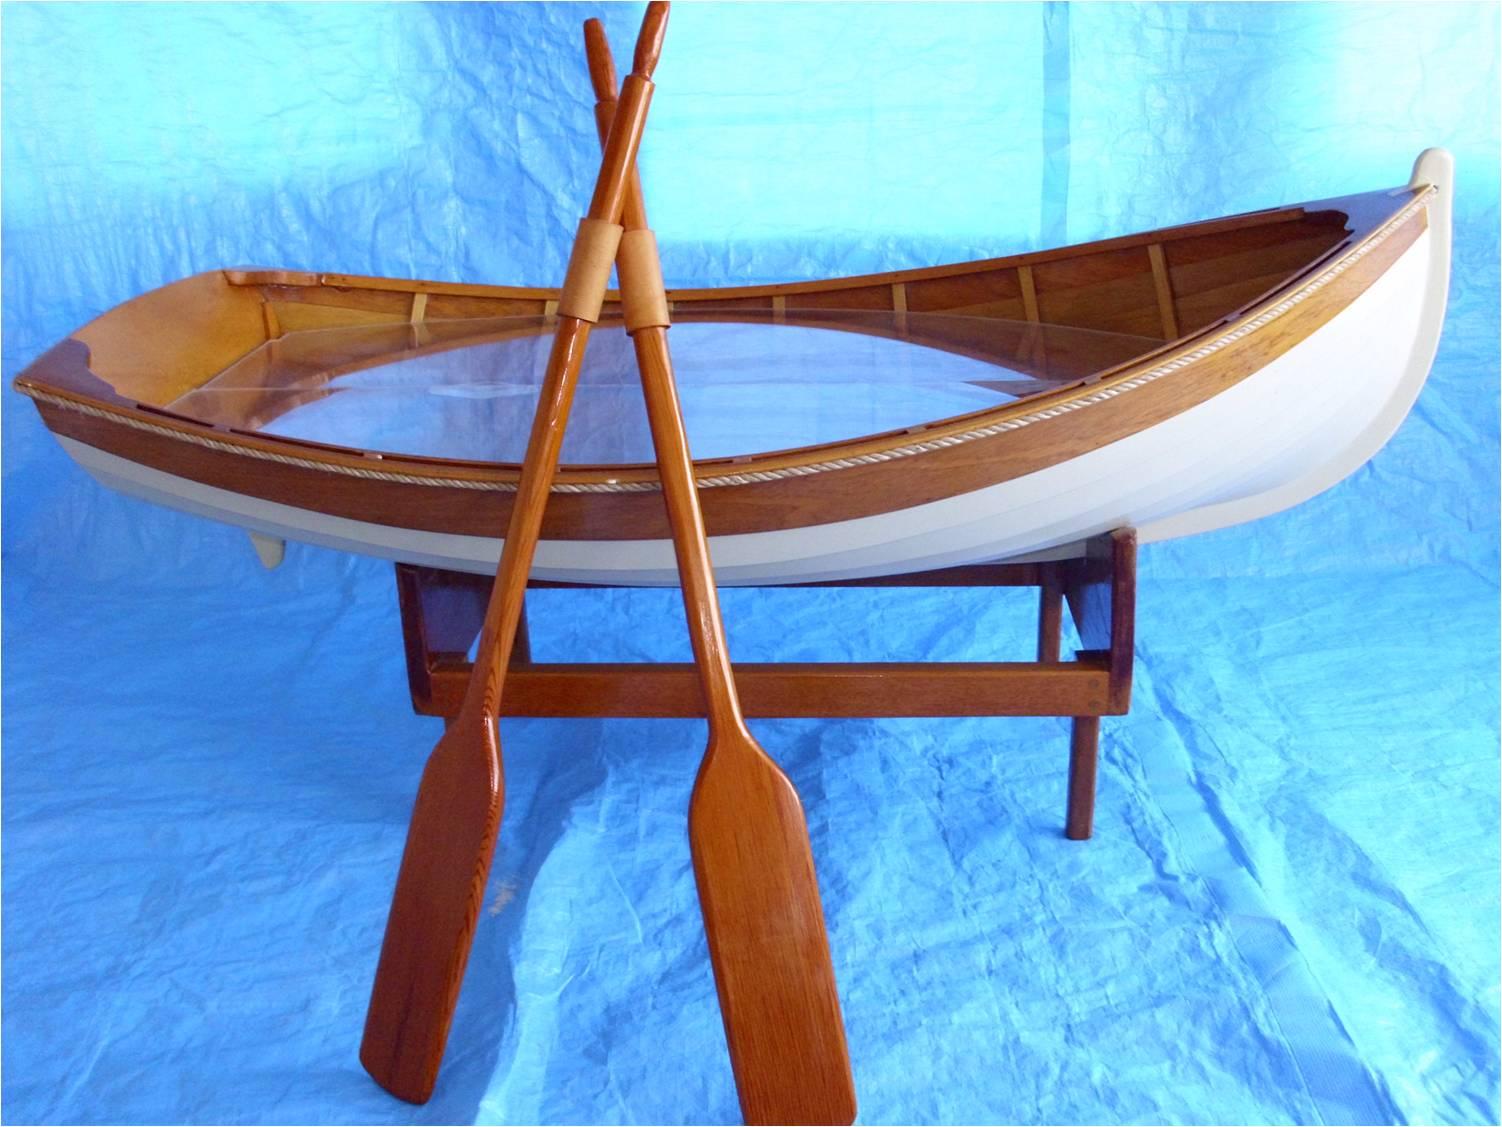 used captain chairs for boats bean bag at walmart large mahogany wood boat martin nautical antiques